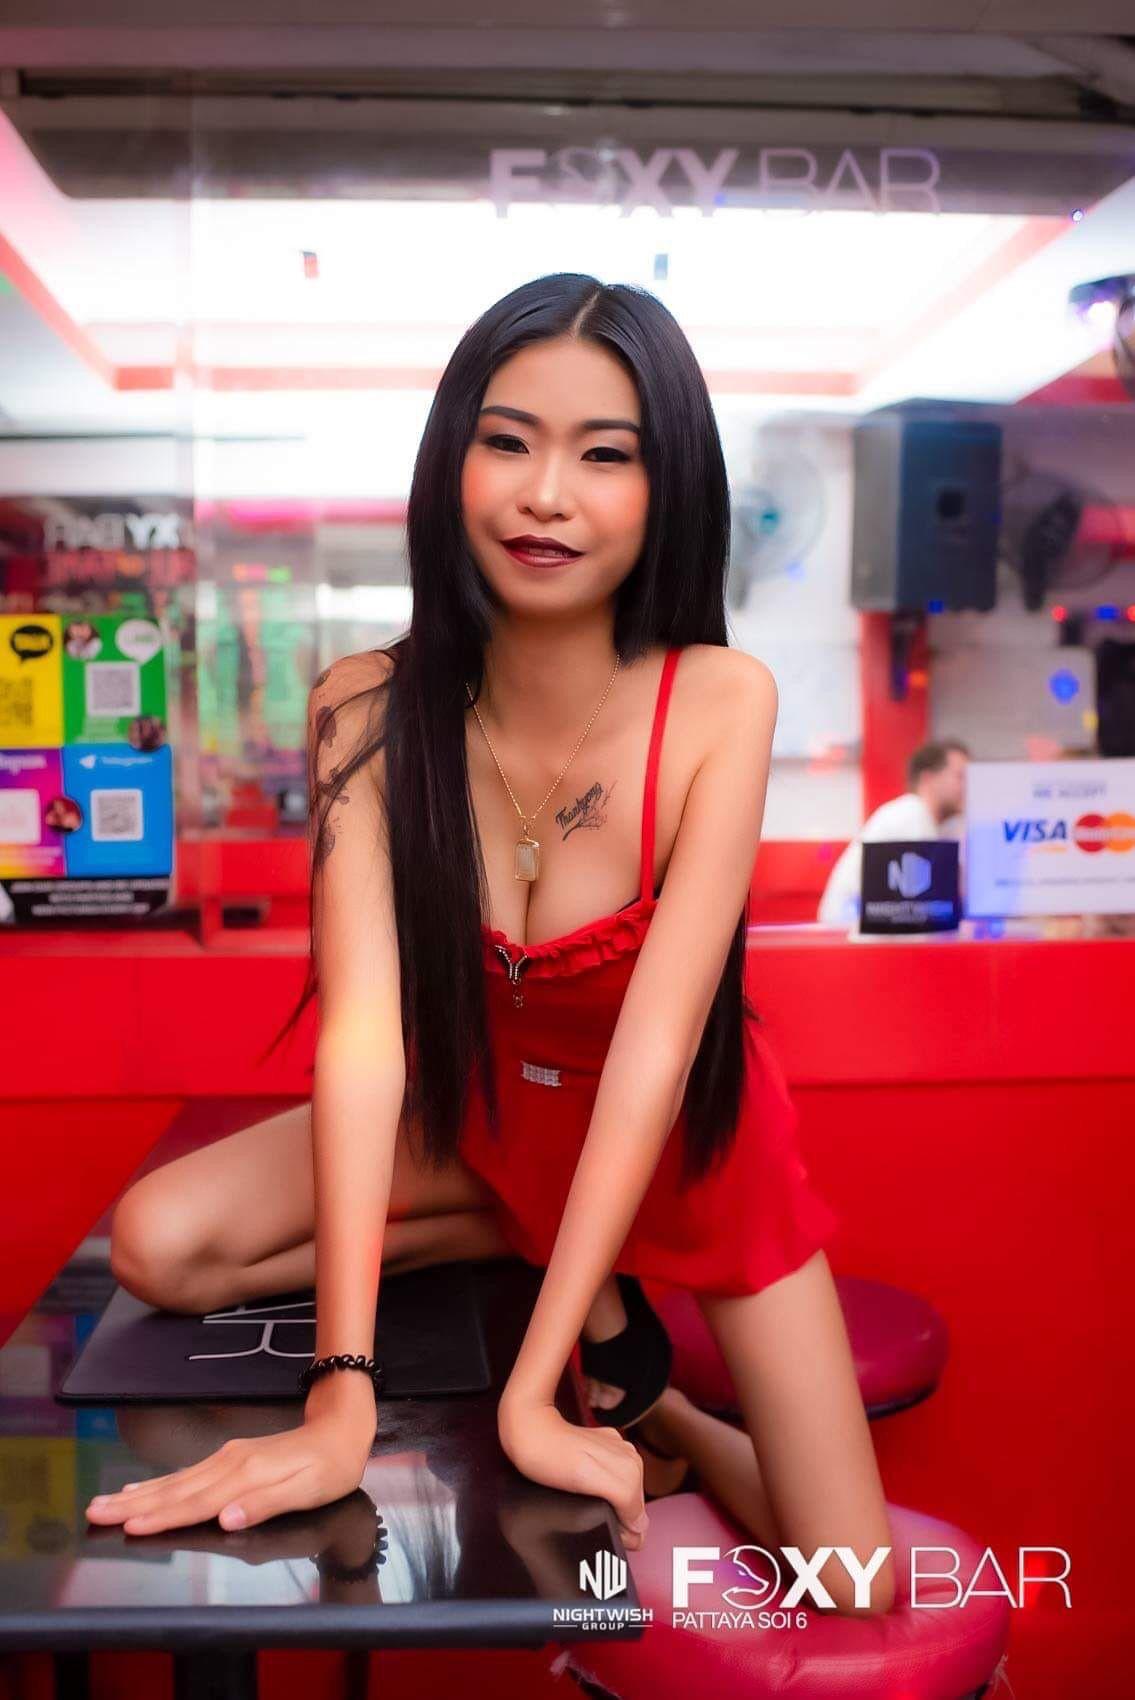 Foxy bar Soi 6   Pattaya, Pub, Foxy